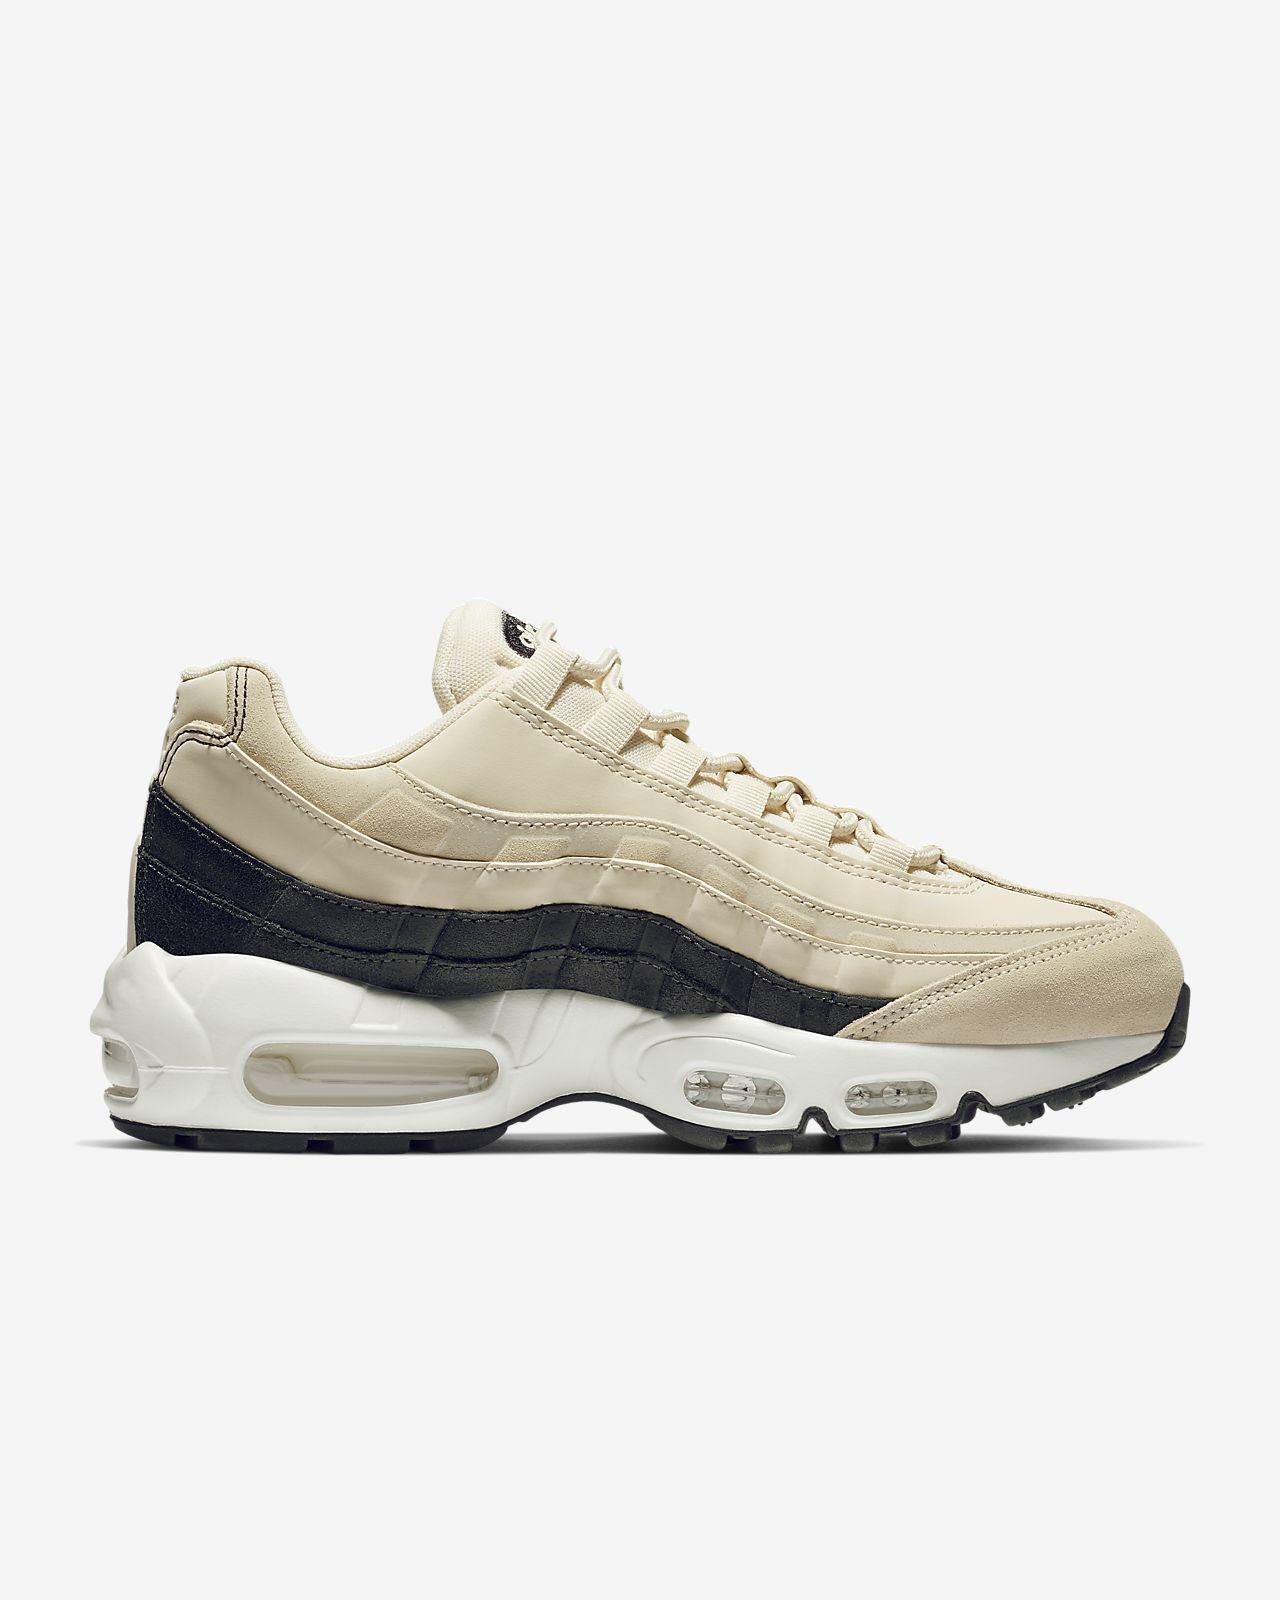 promo code 74348 626e7 Women s Shoe. Nike Air Max 95 Premium